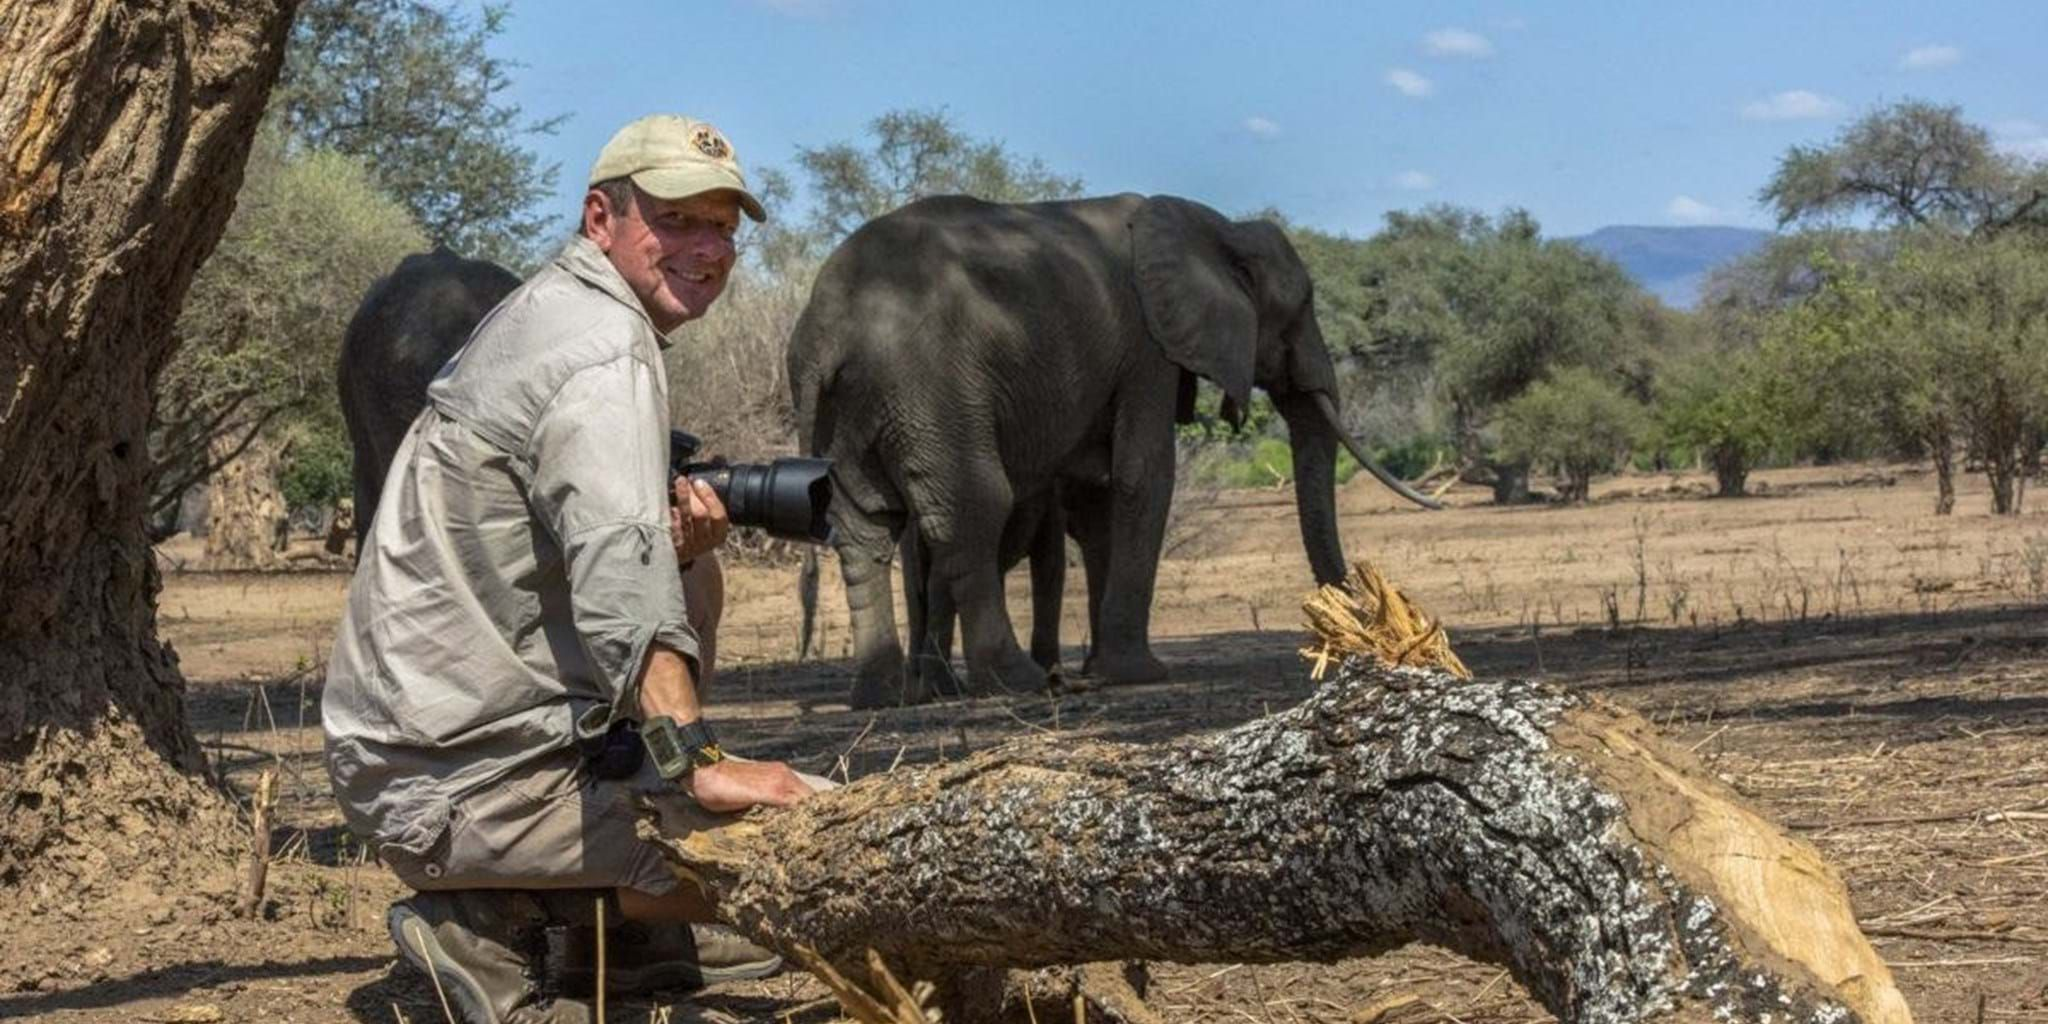 Zimbabwe Mana Pools Wild Dogs Safari Special With Award-Winning Photographer Nick Dyer